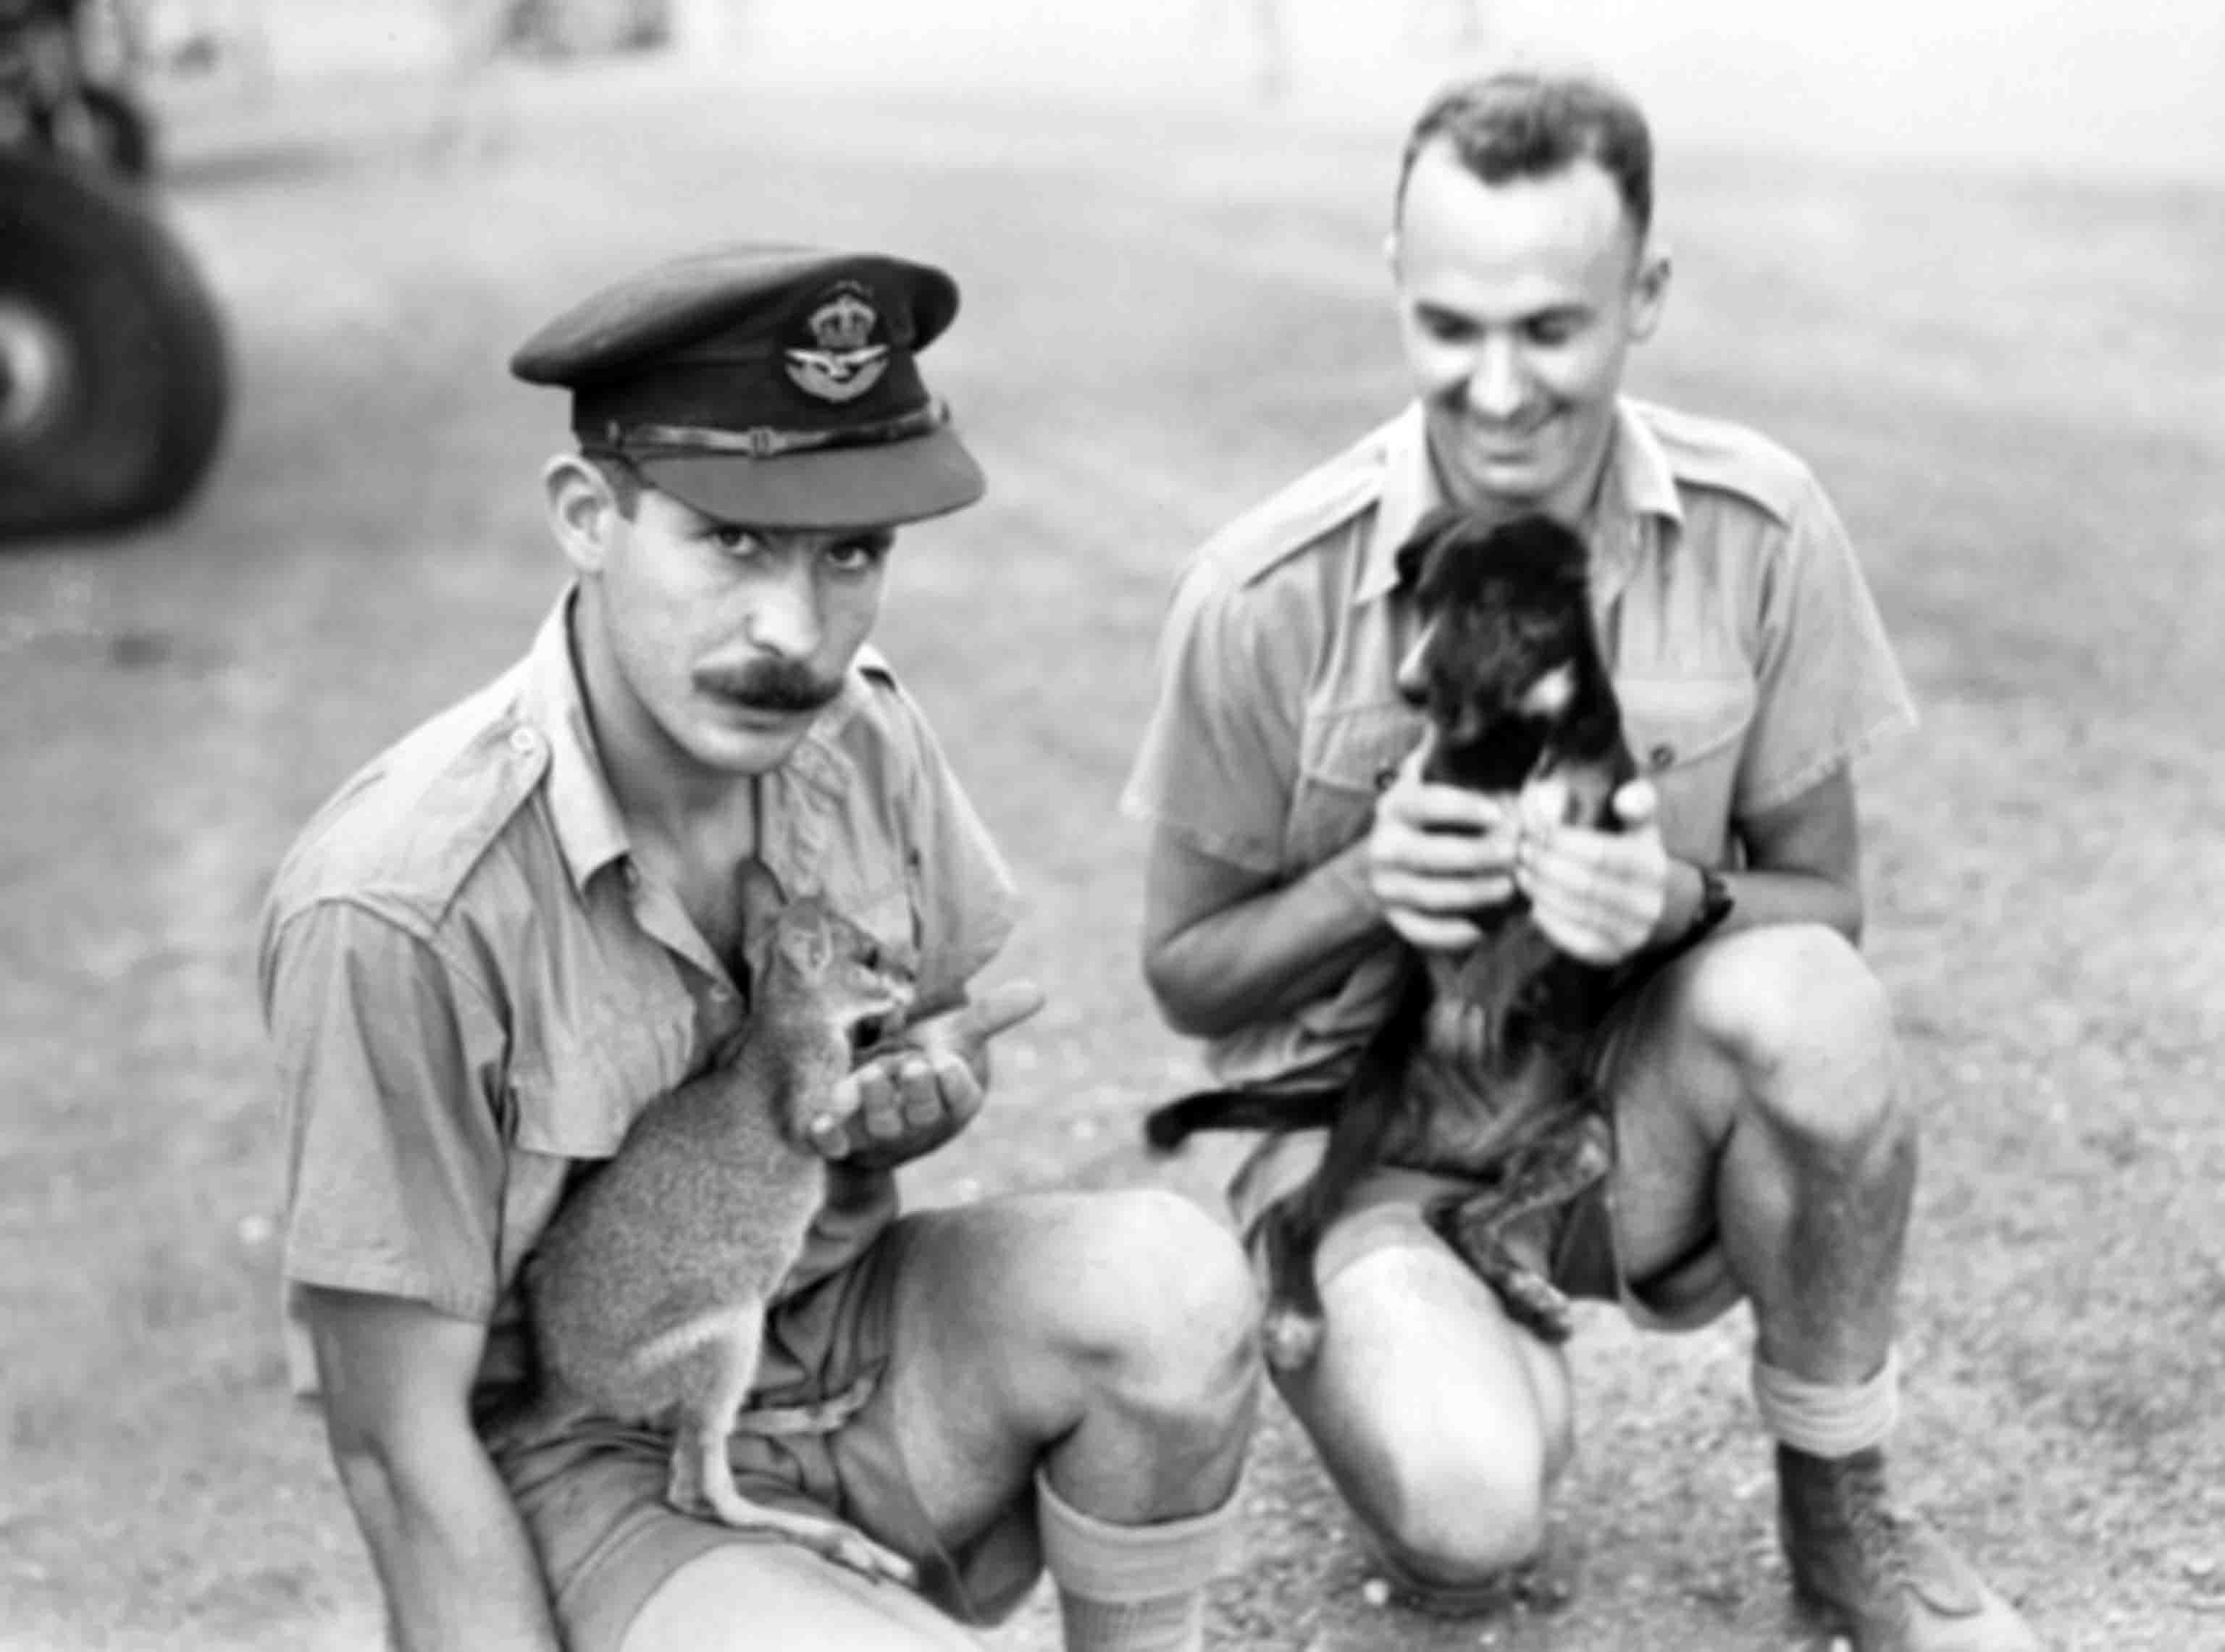 Australian military pilot